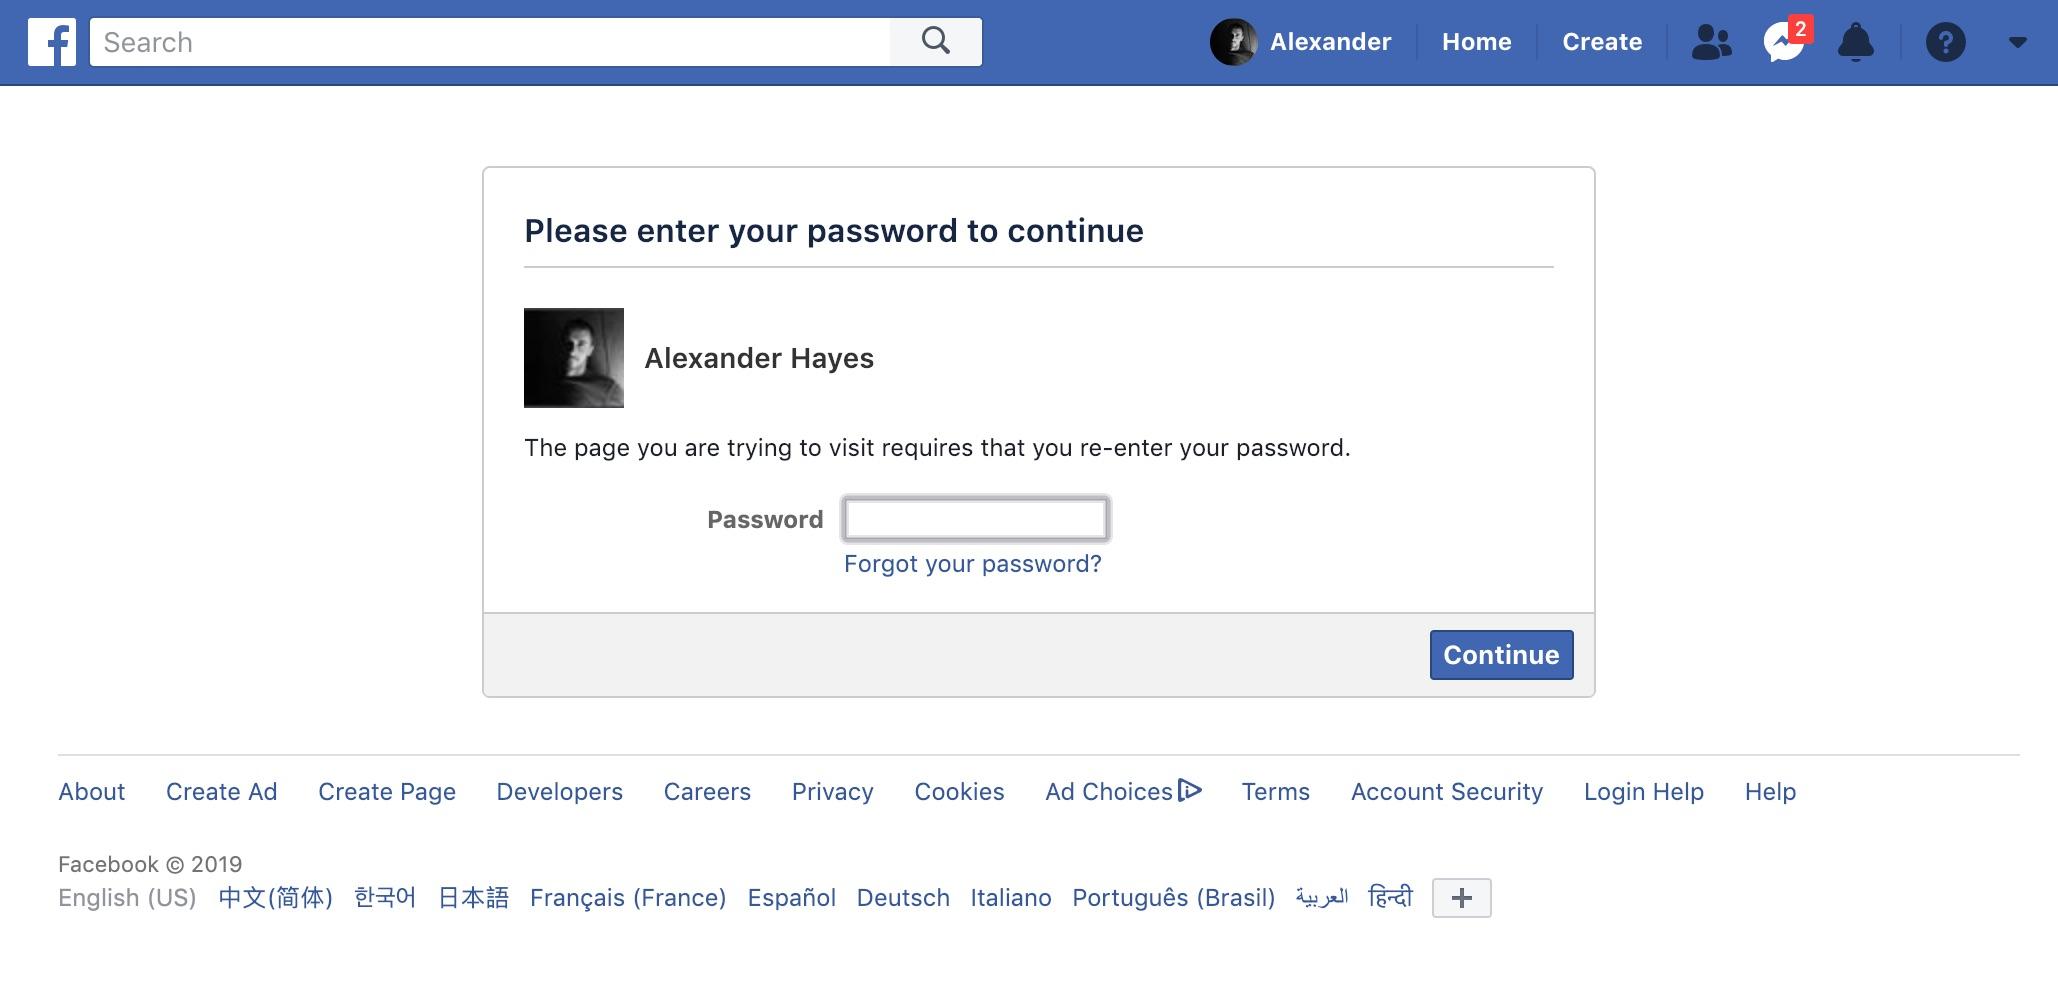 password-re-entry.jpg